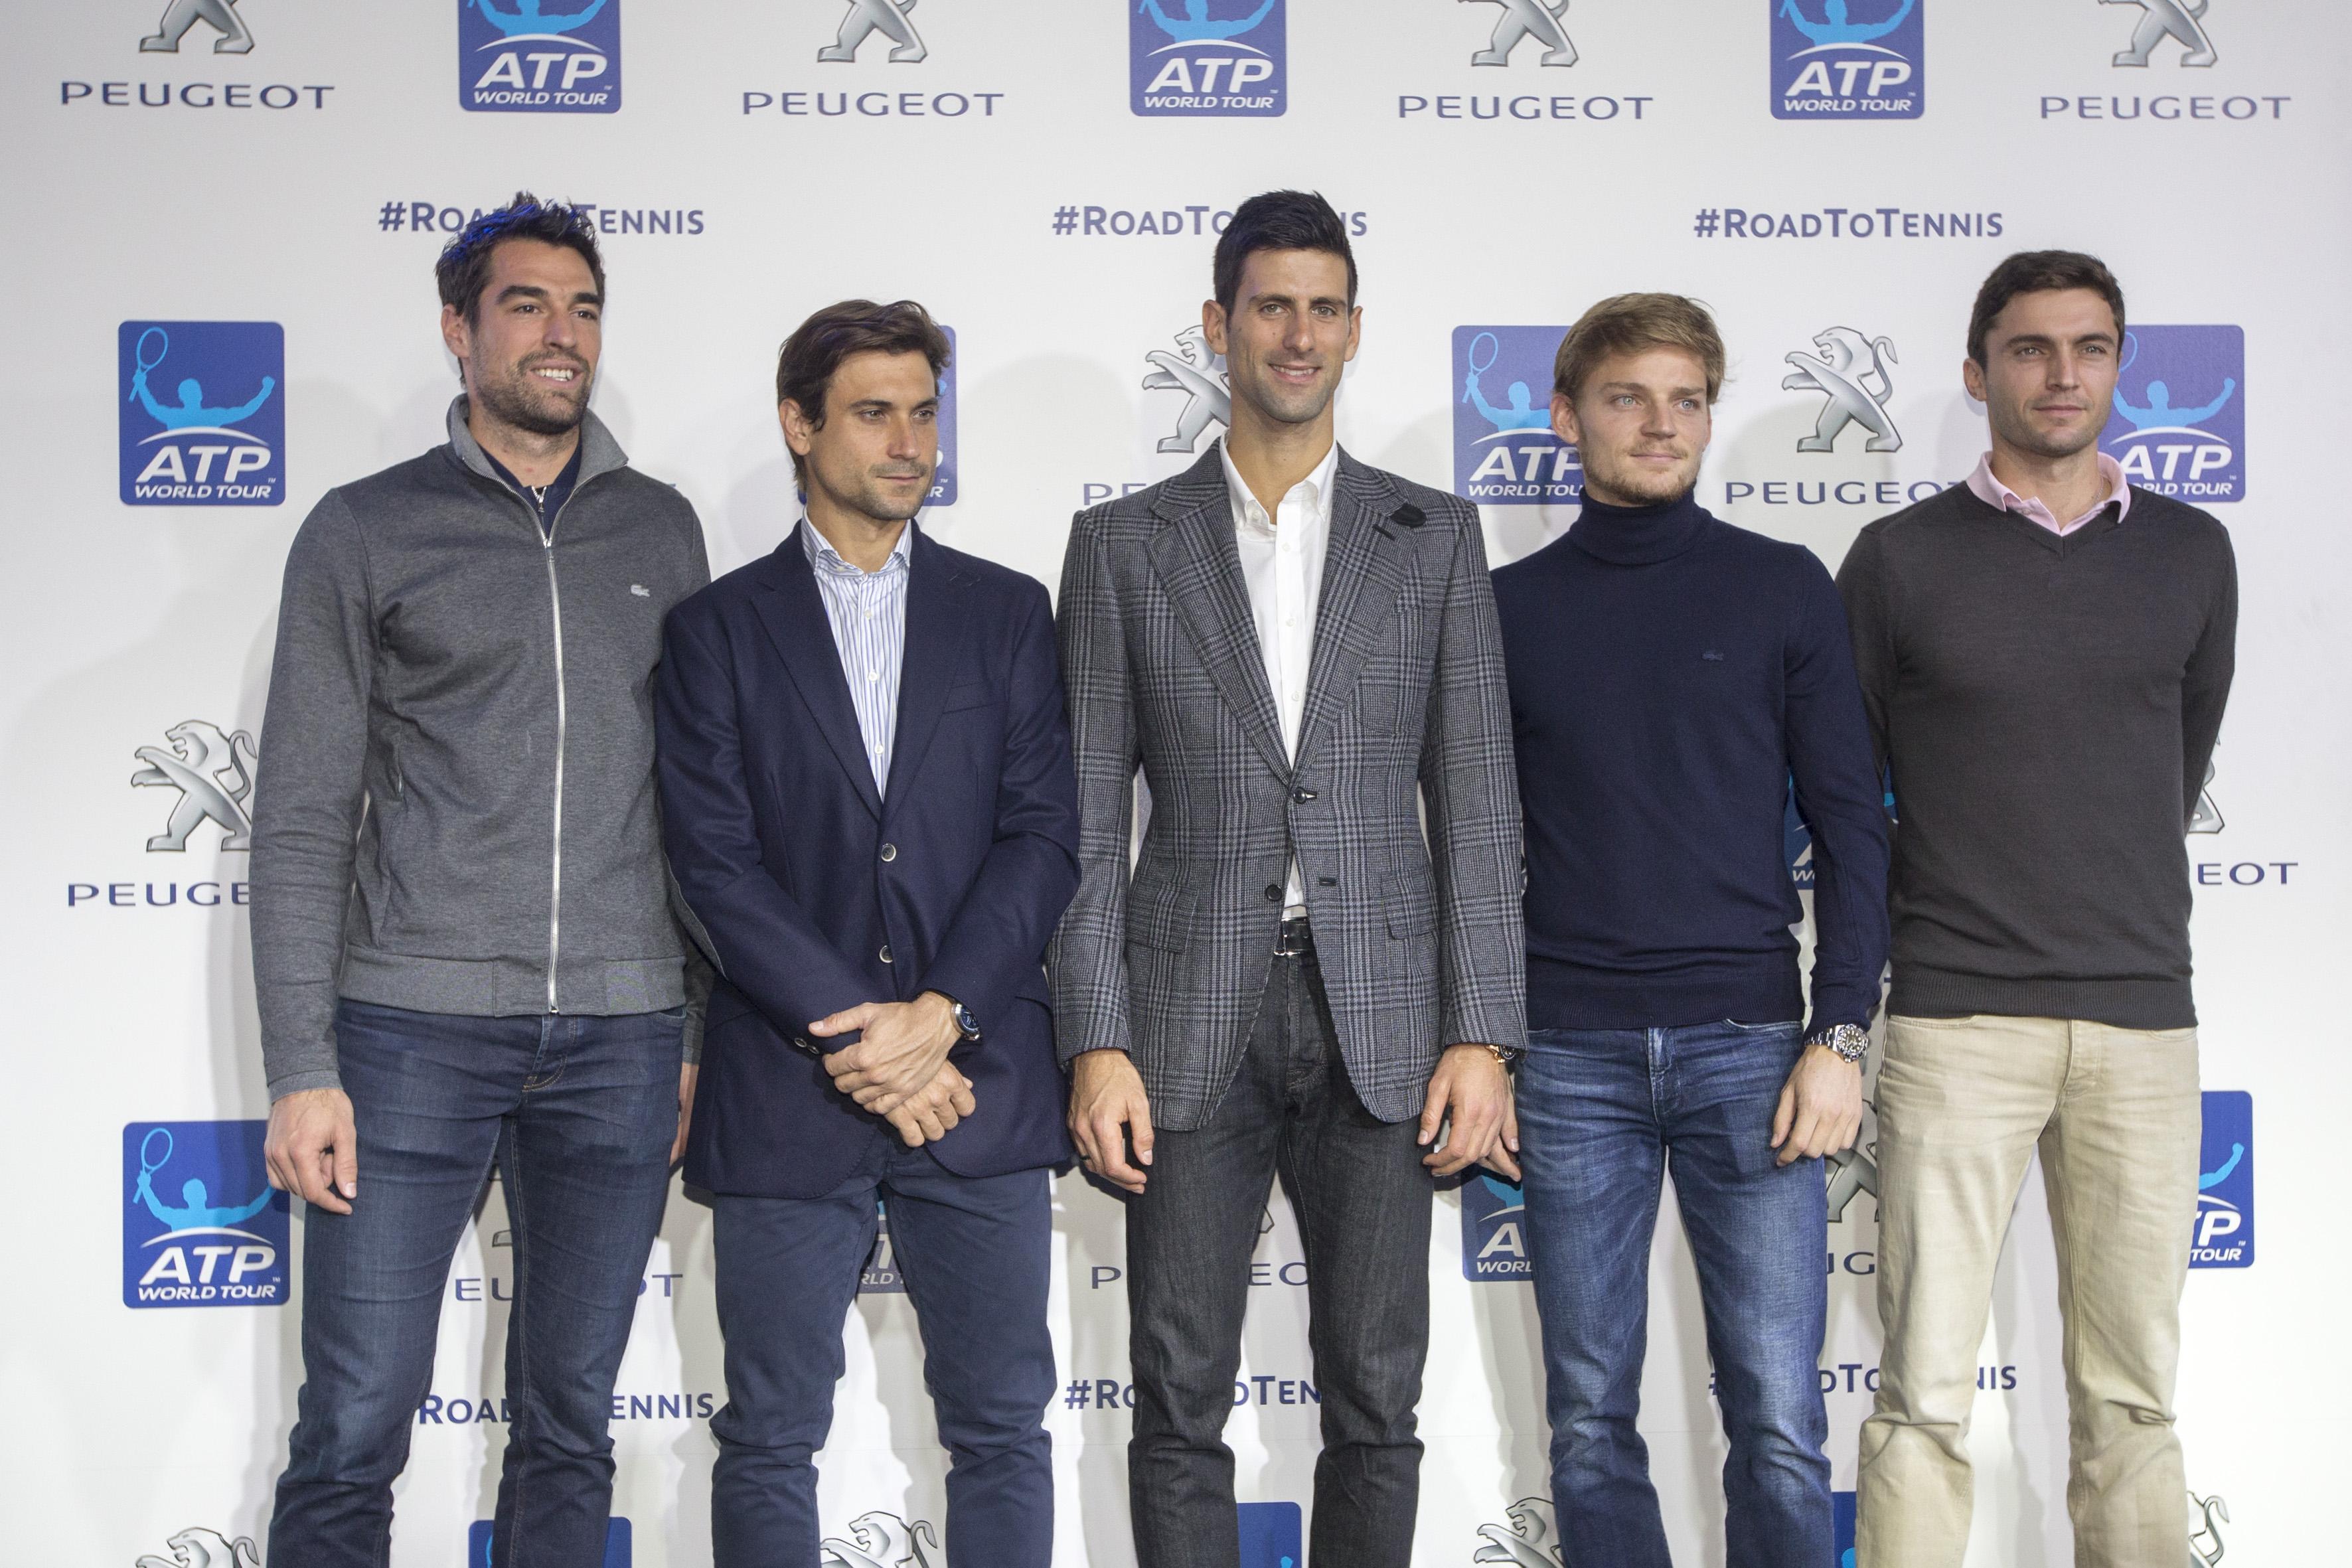 Peugeot, roland garros, tennis, novak djokovic, roland garros 2016, road to roland garros, kuerten, goffin, simon, ferrer, chardy